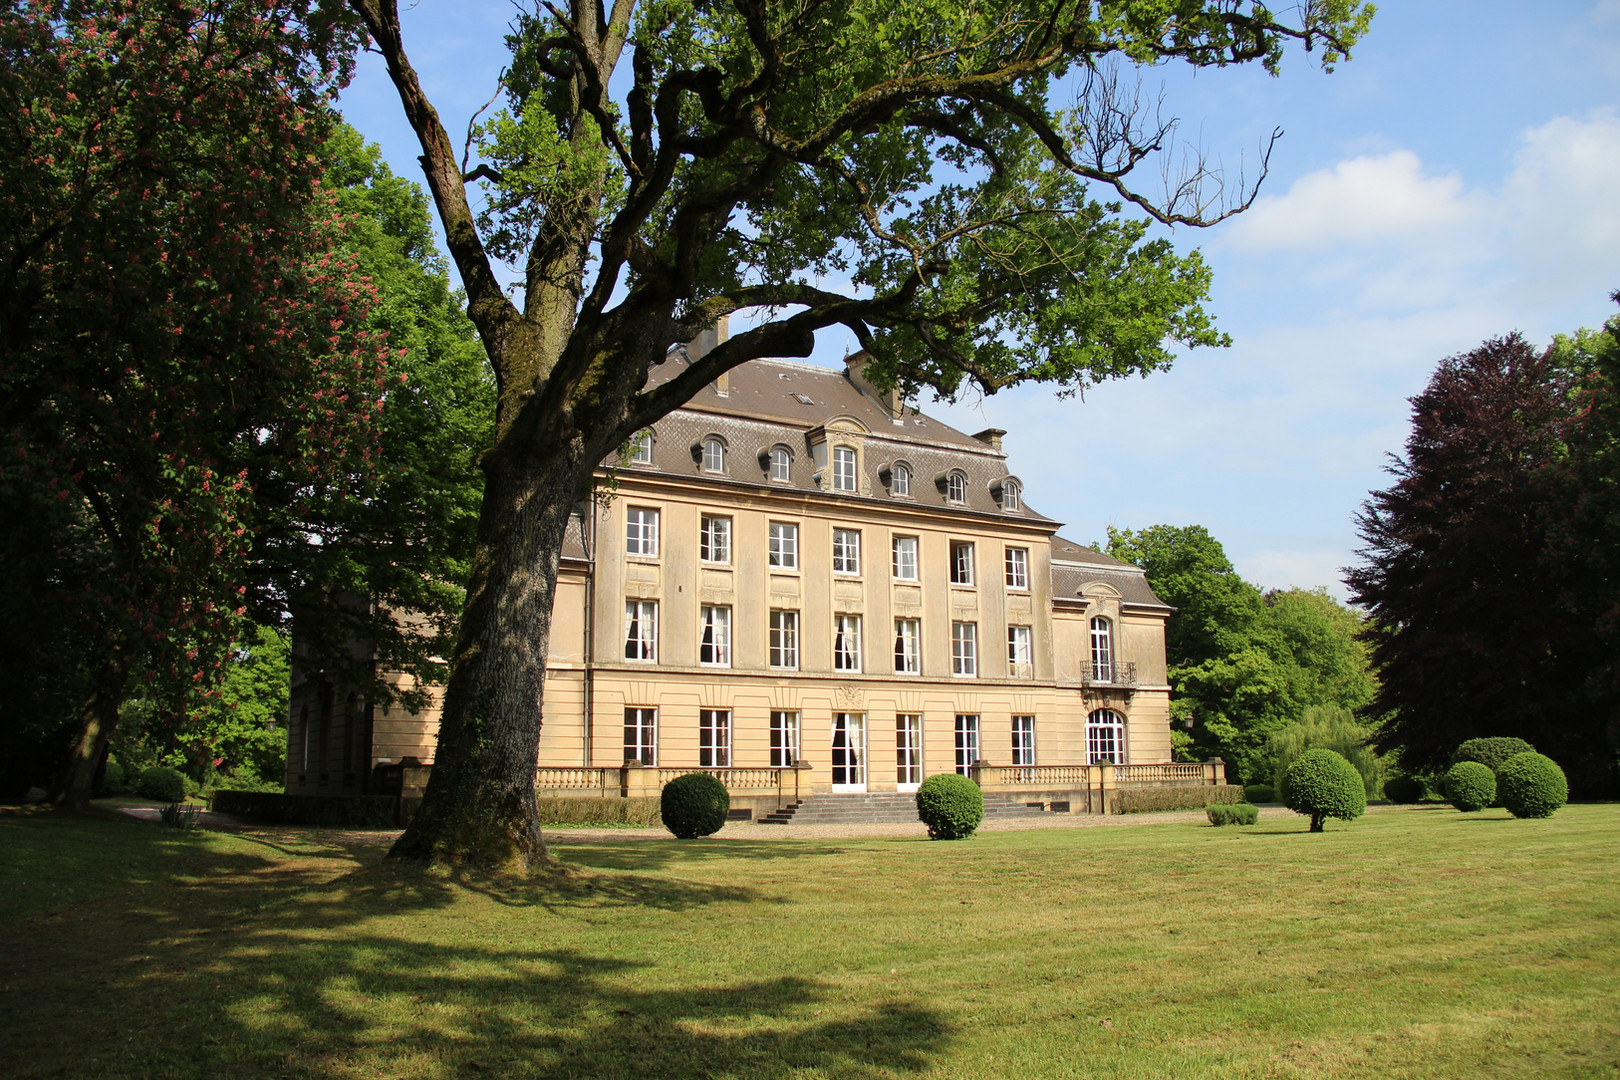 Château de Bétange côté étang